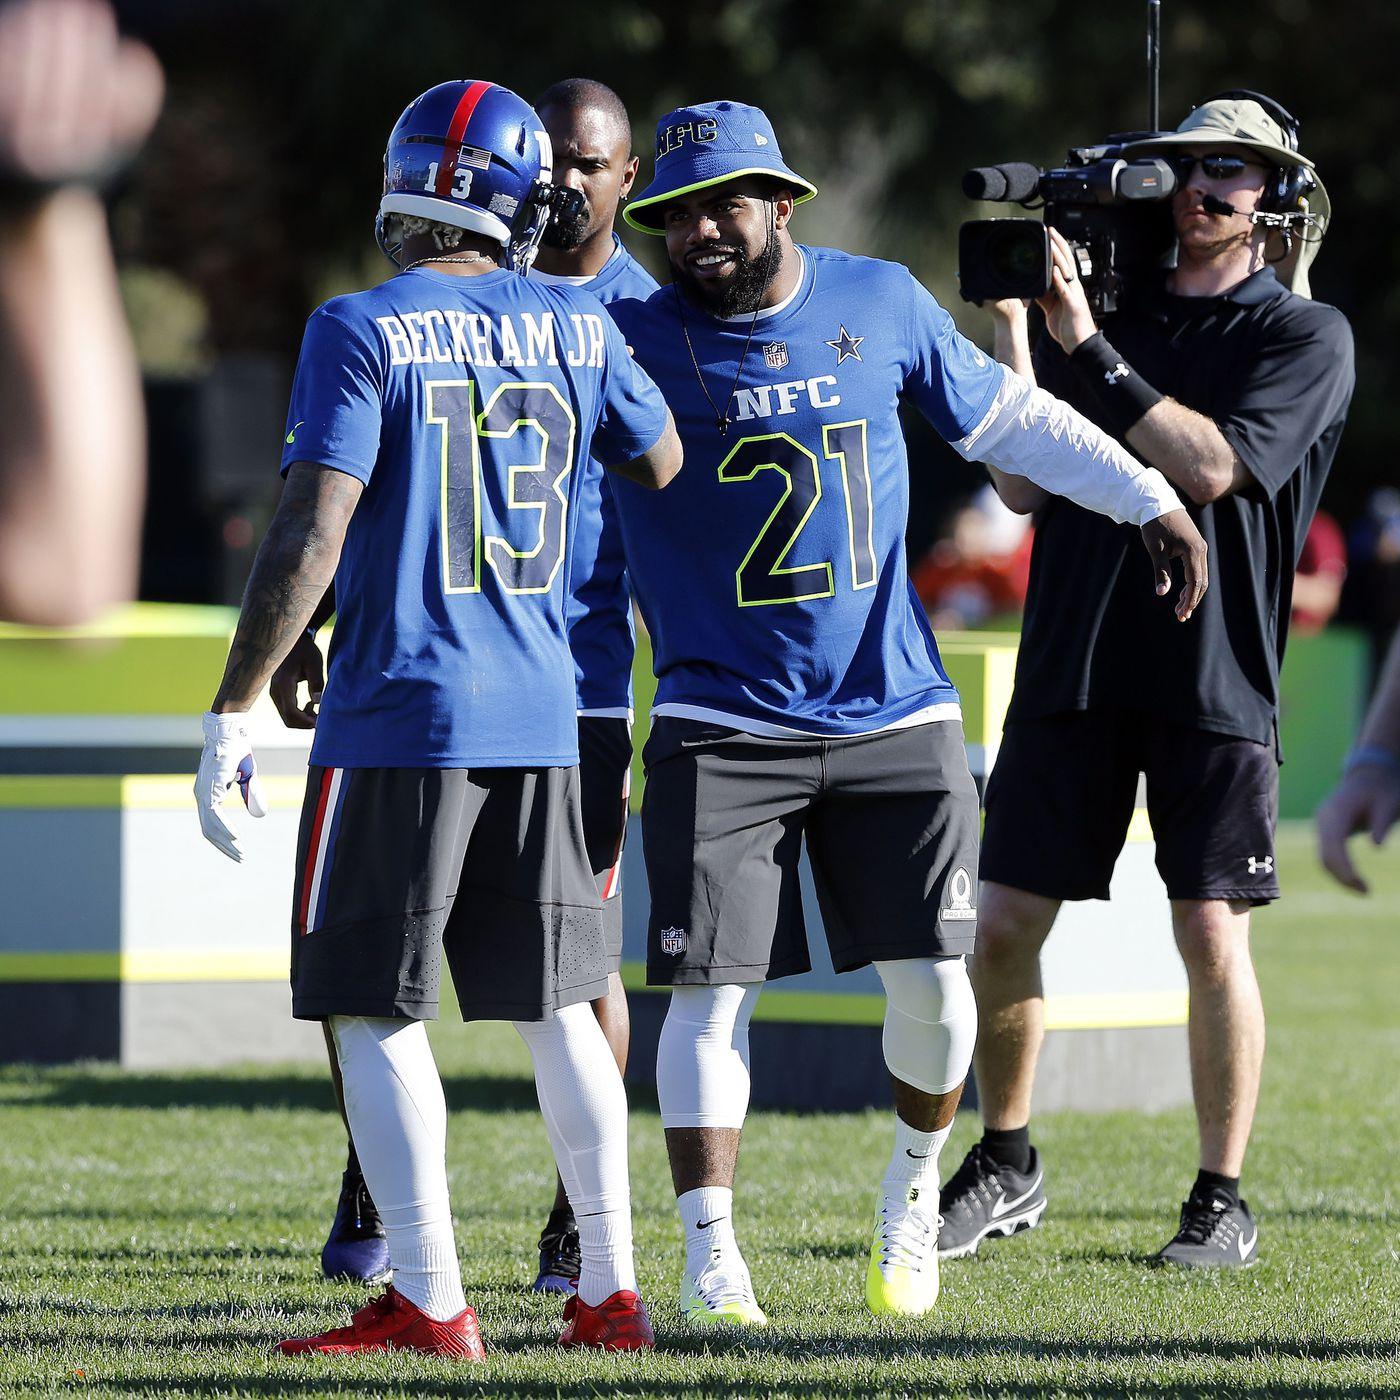 brand new 0b0c2 dd727 NFC Pro Bowl roster 2017: Ezekiel Elliott and Odell Beckham ...